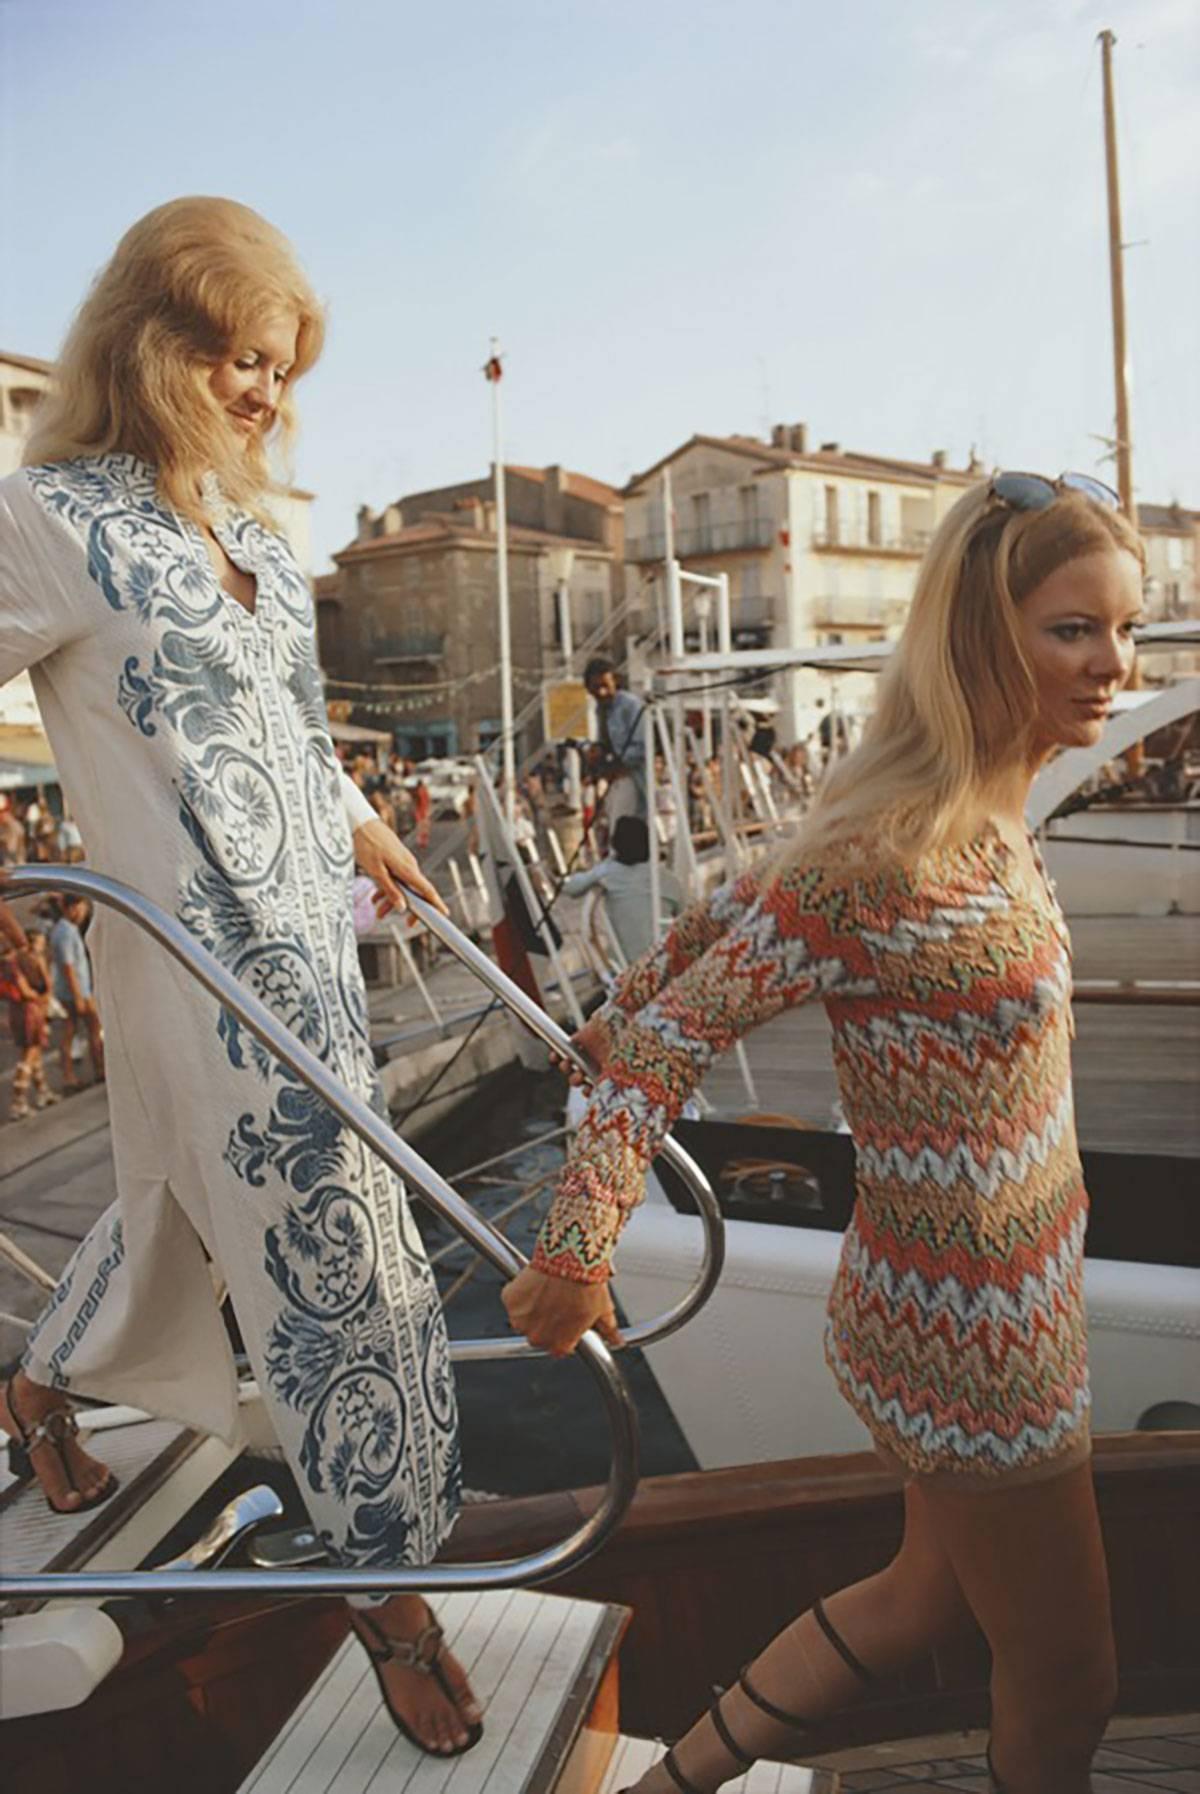 Saint Tropez, Fashionable Ladies Disembark (Slim Aarons Estate Edition)